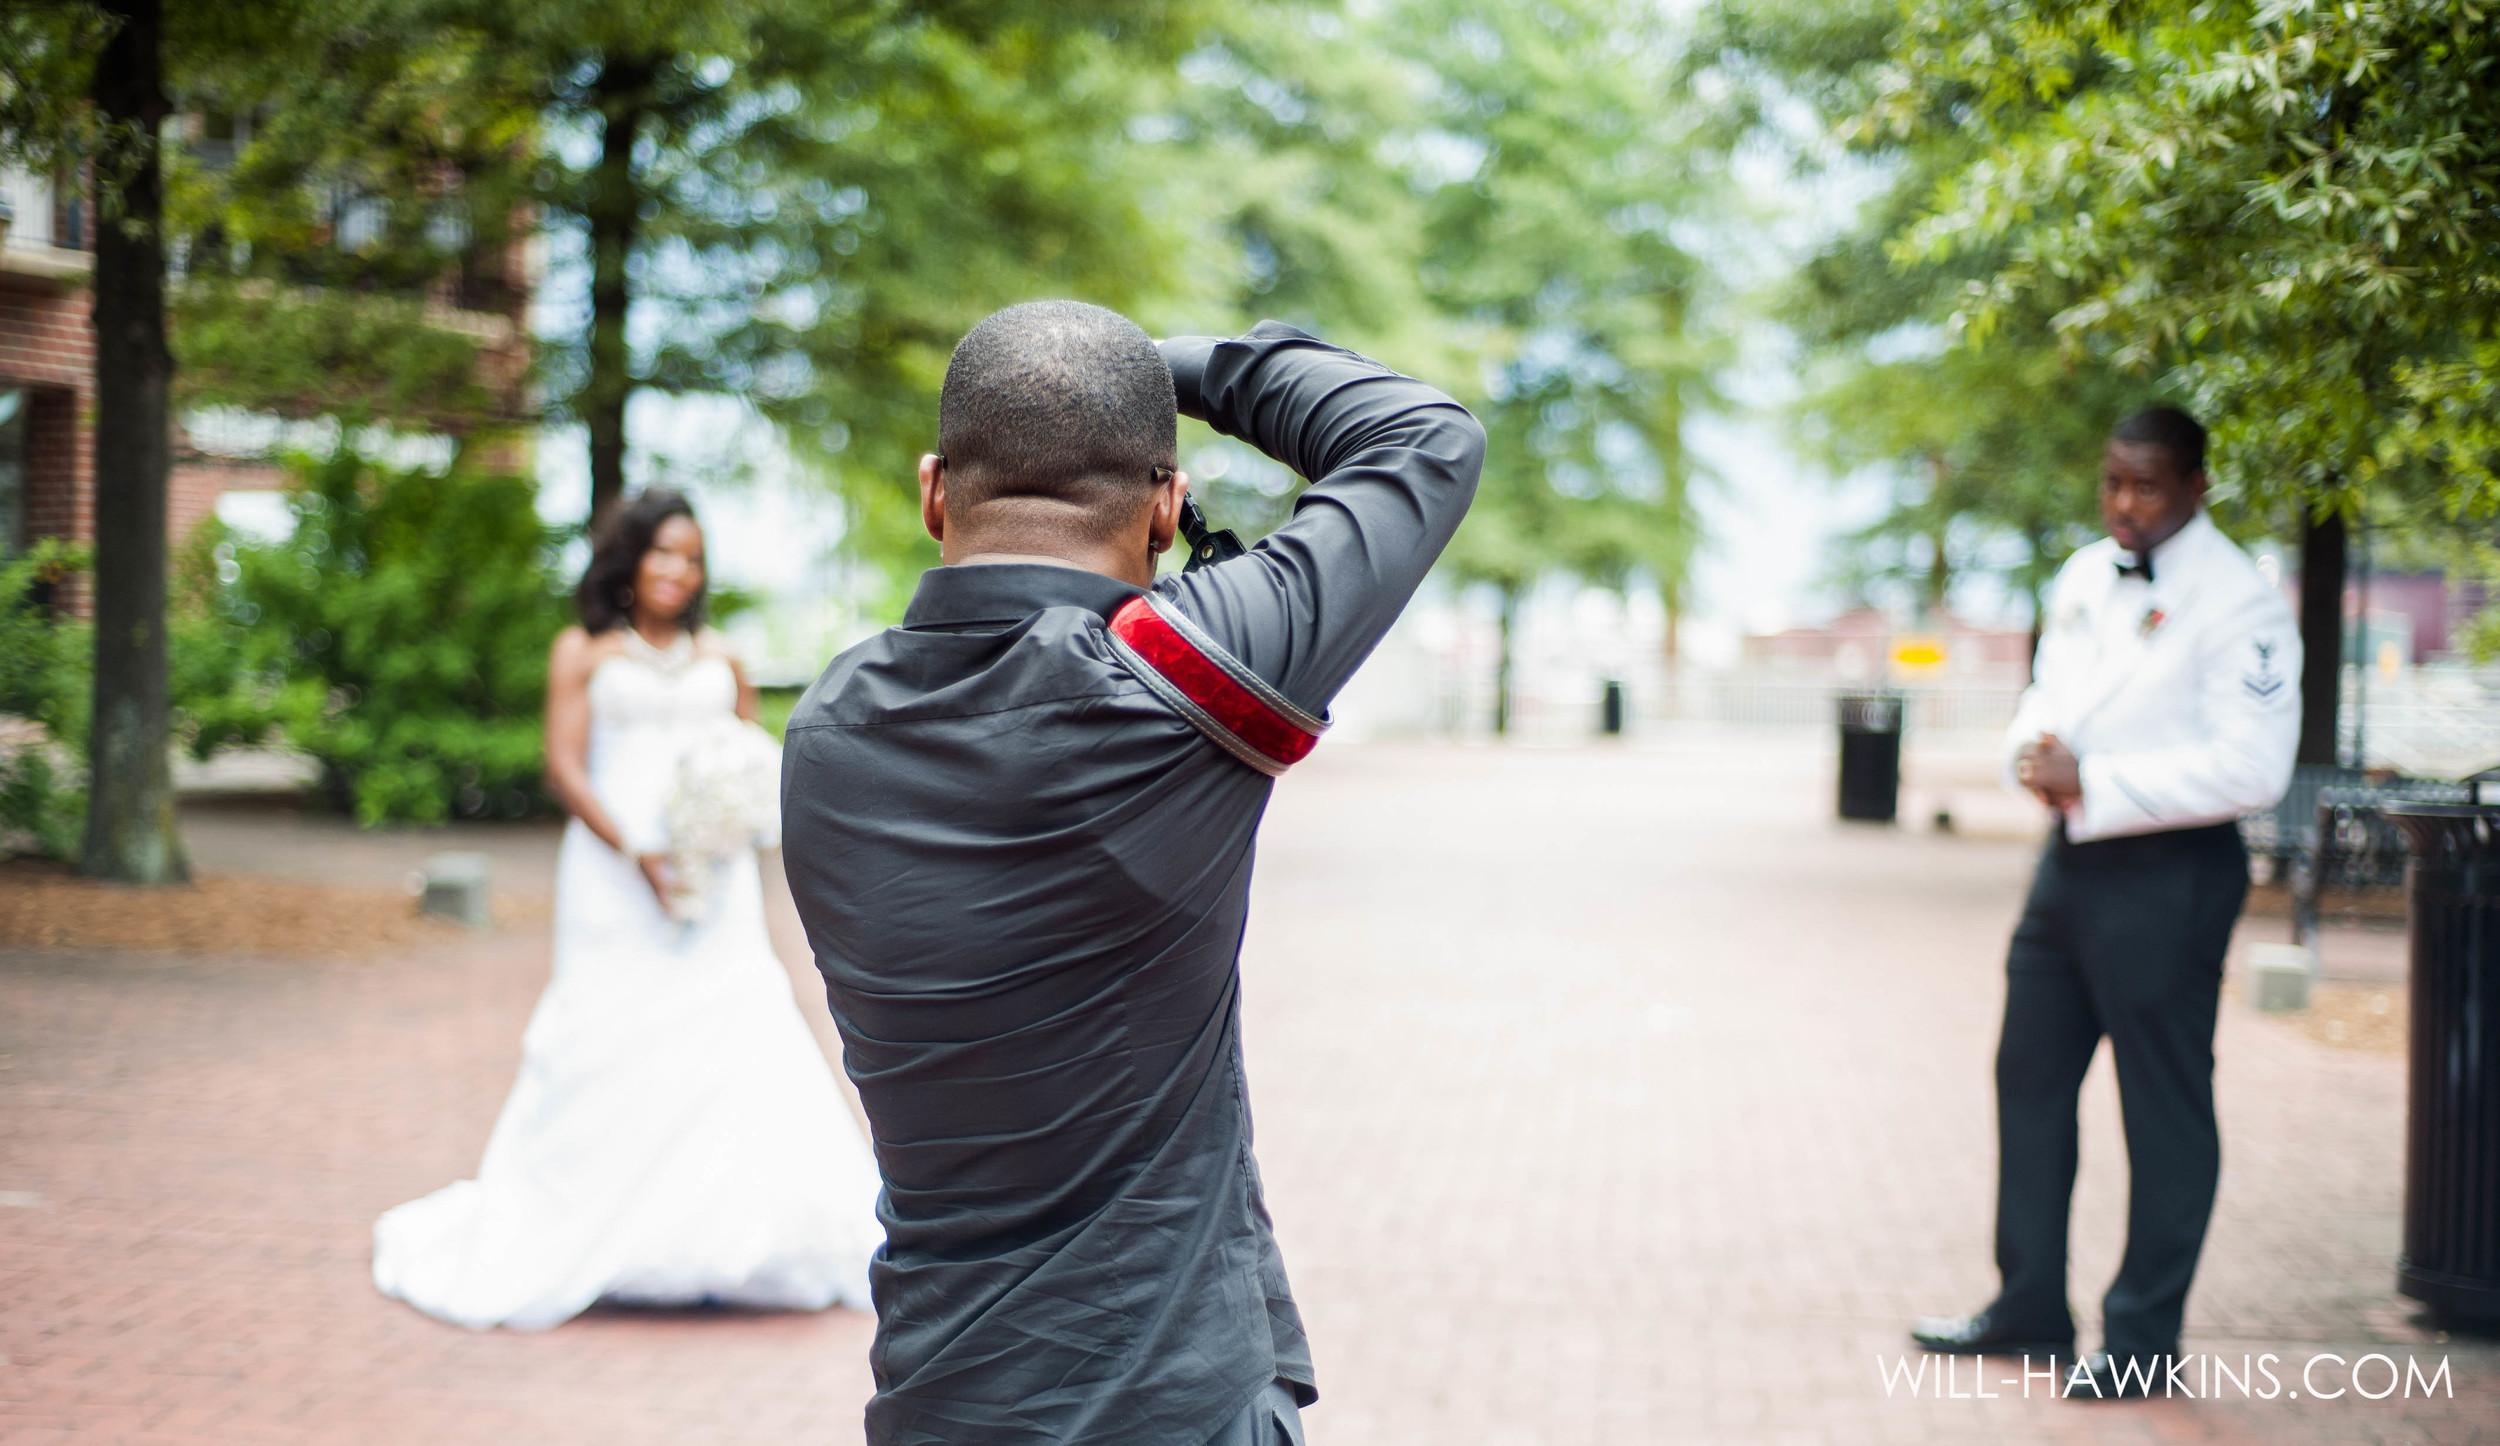 Will Hawkins Photography 2015 Year Review Virginia Beach Wedding Photographer